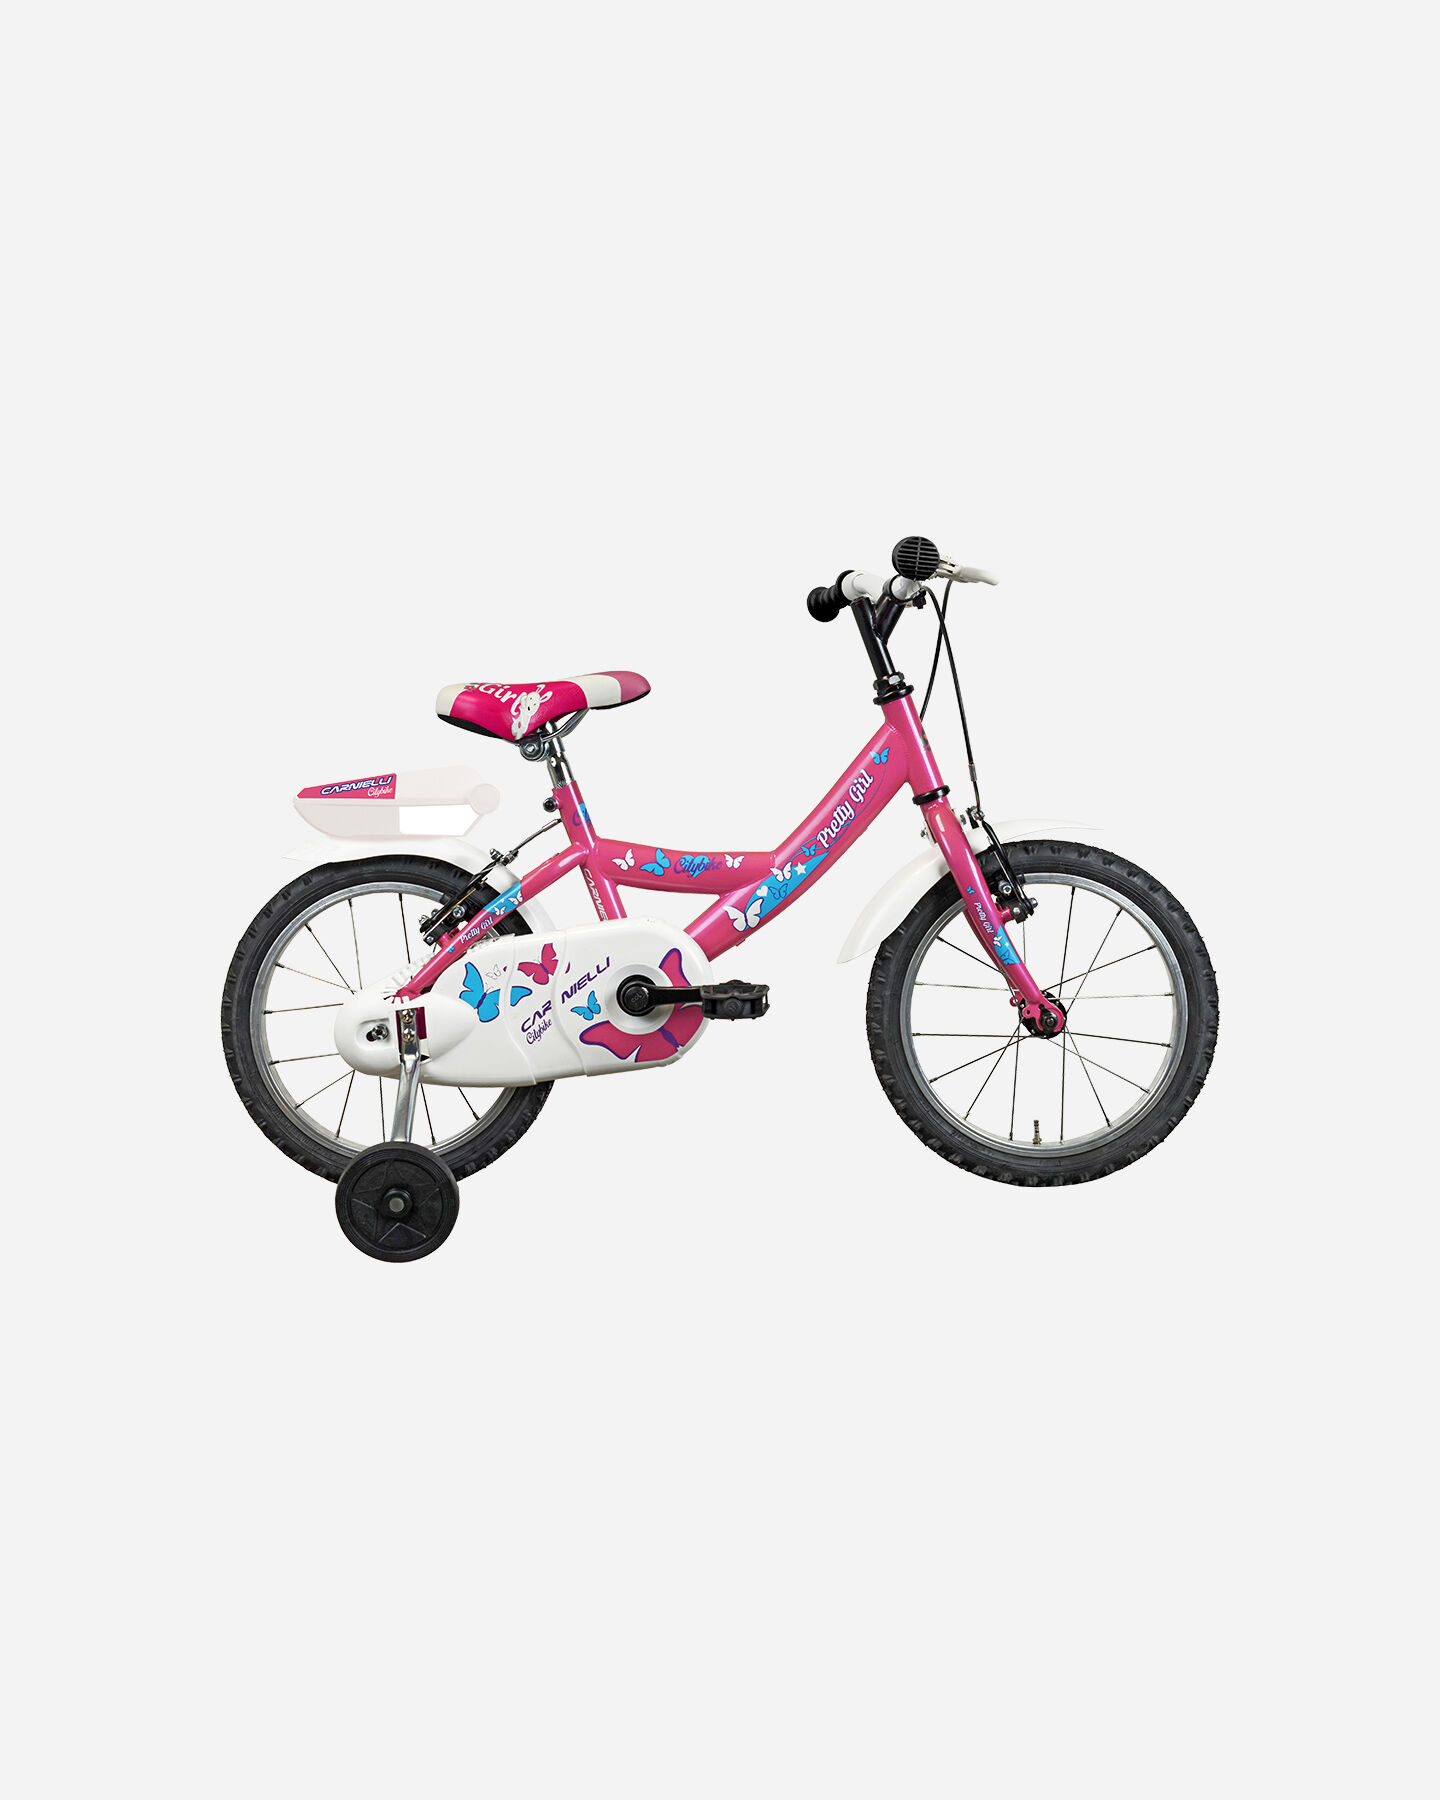 "Bici junior CARNIELLI BIKE 14"" JR S4025976|-|UNI scatto 0"